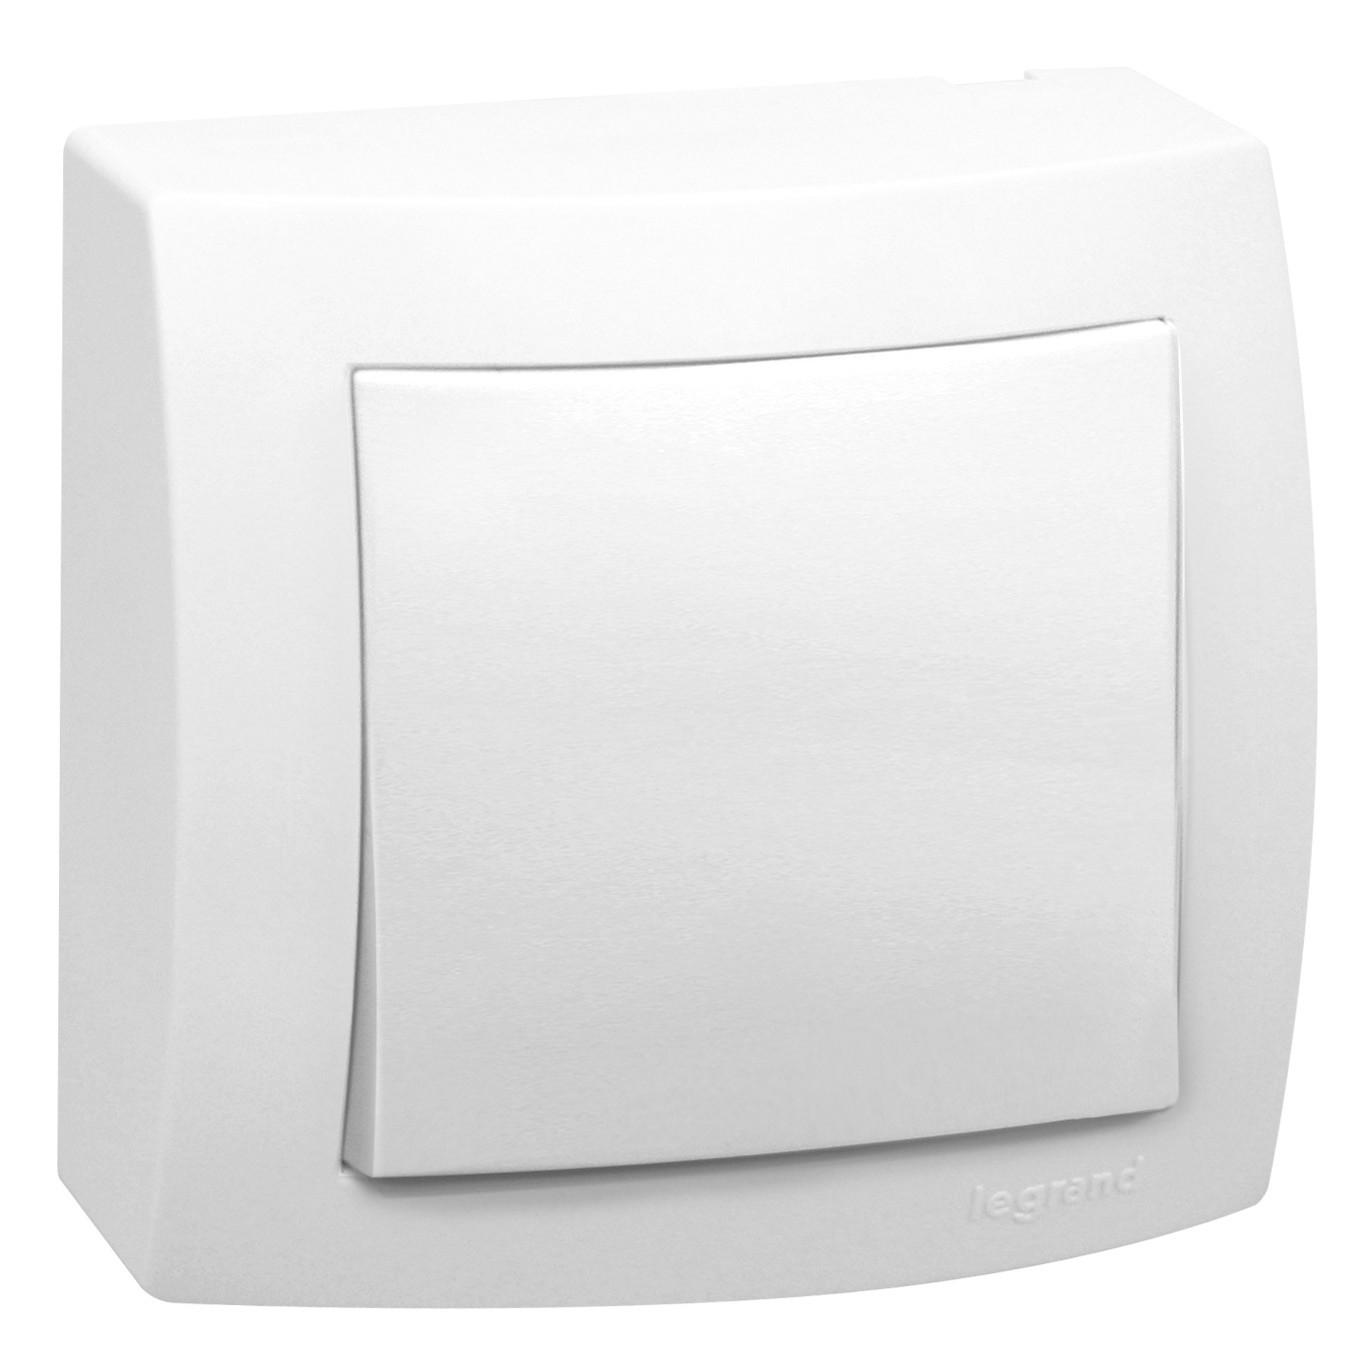 Conjunto Interruptor Paralelo 1 Modulo 10A - Branco - Sistema X - Legrand